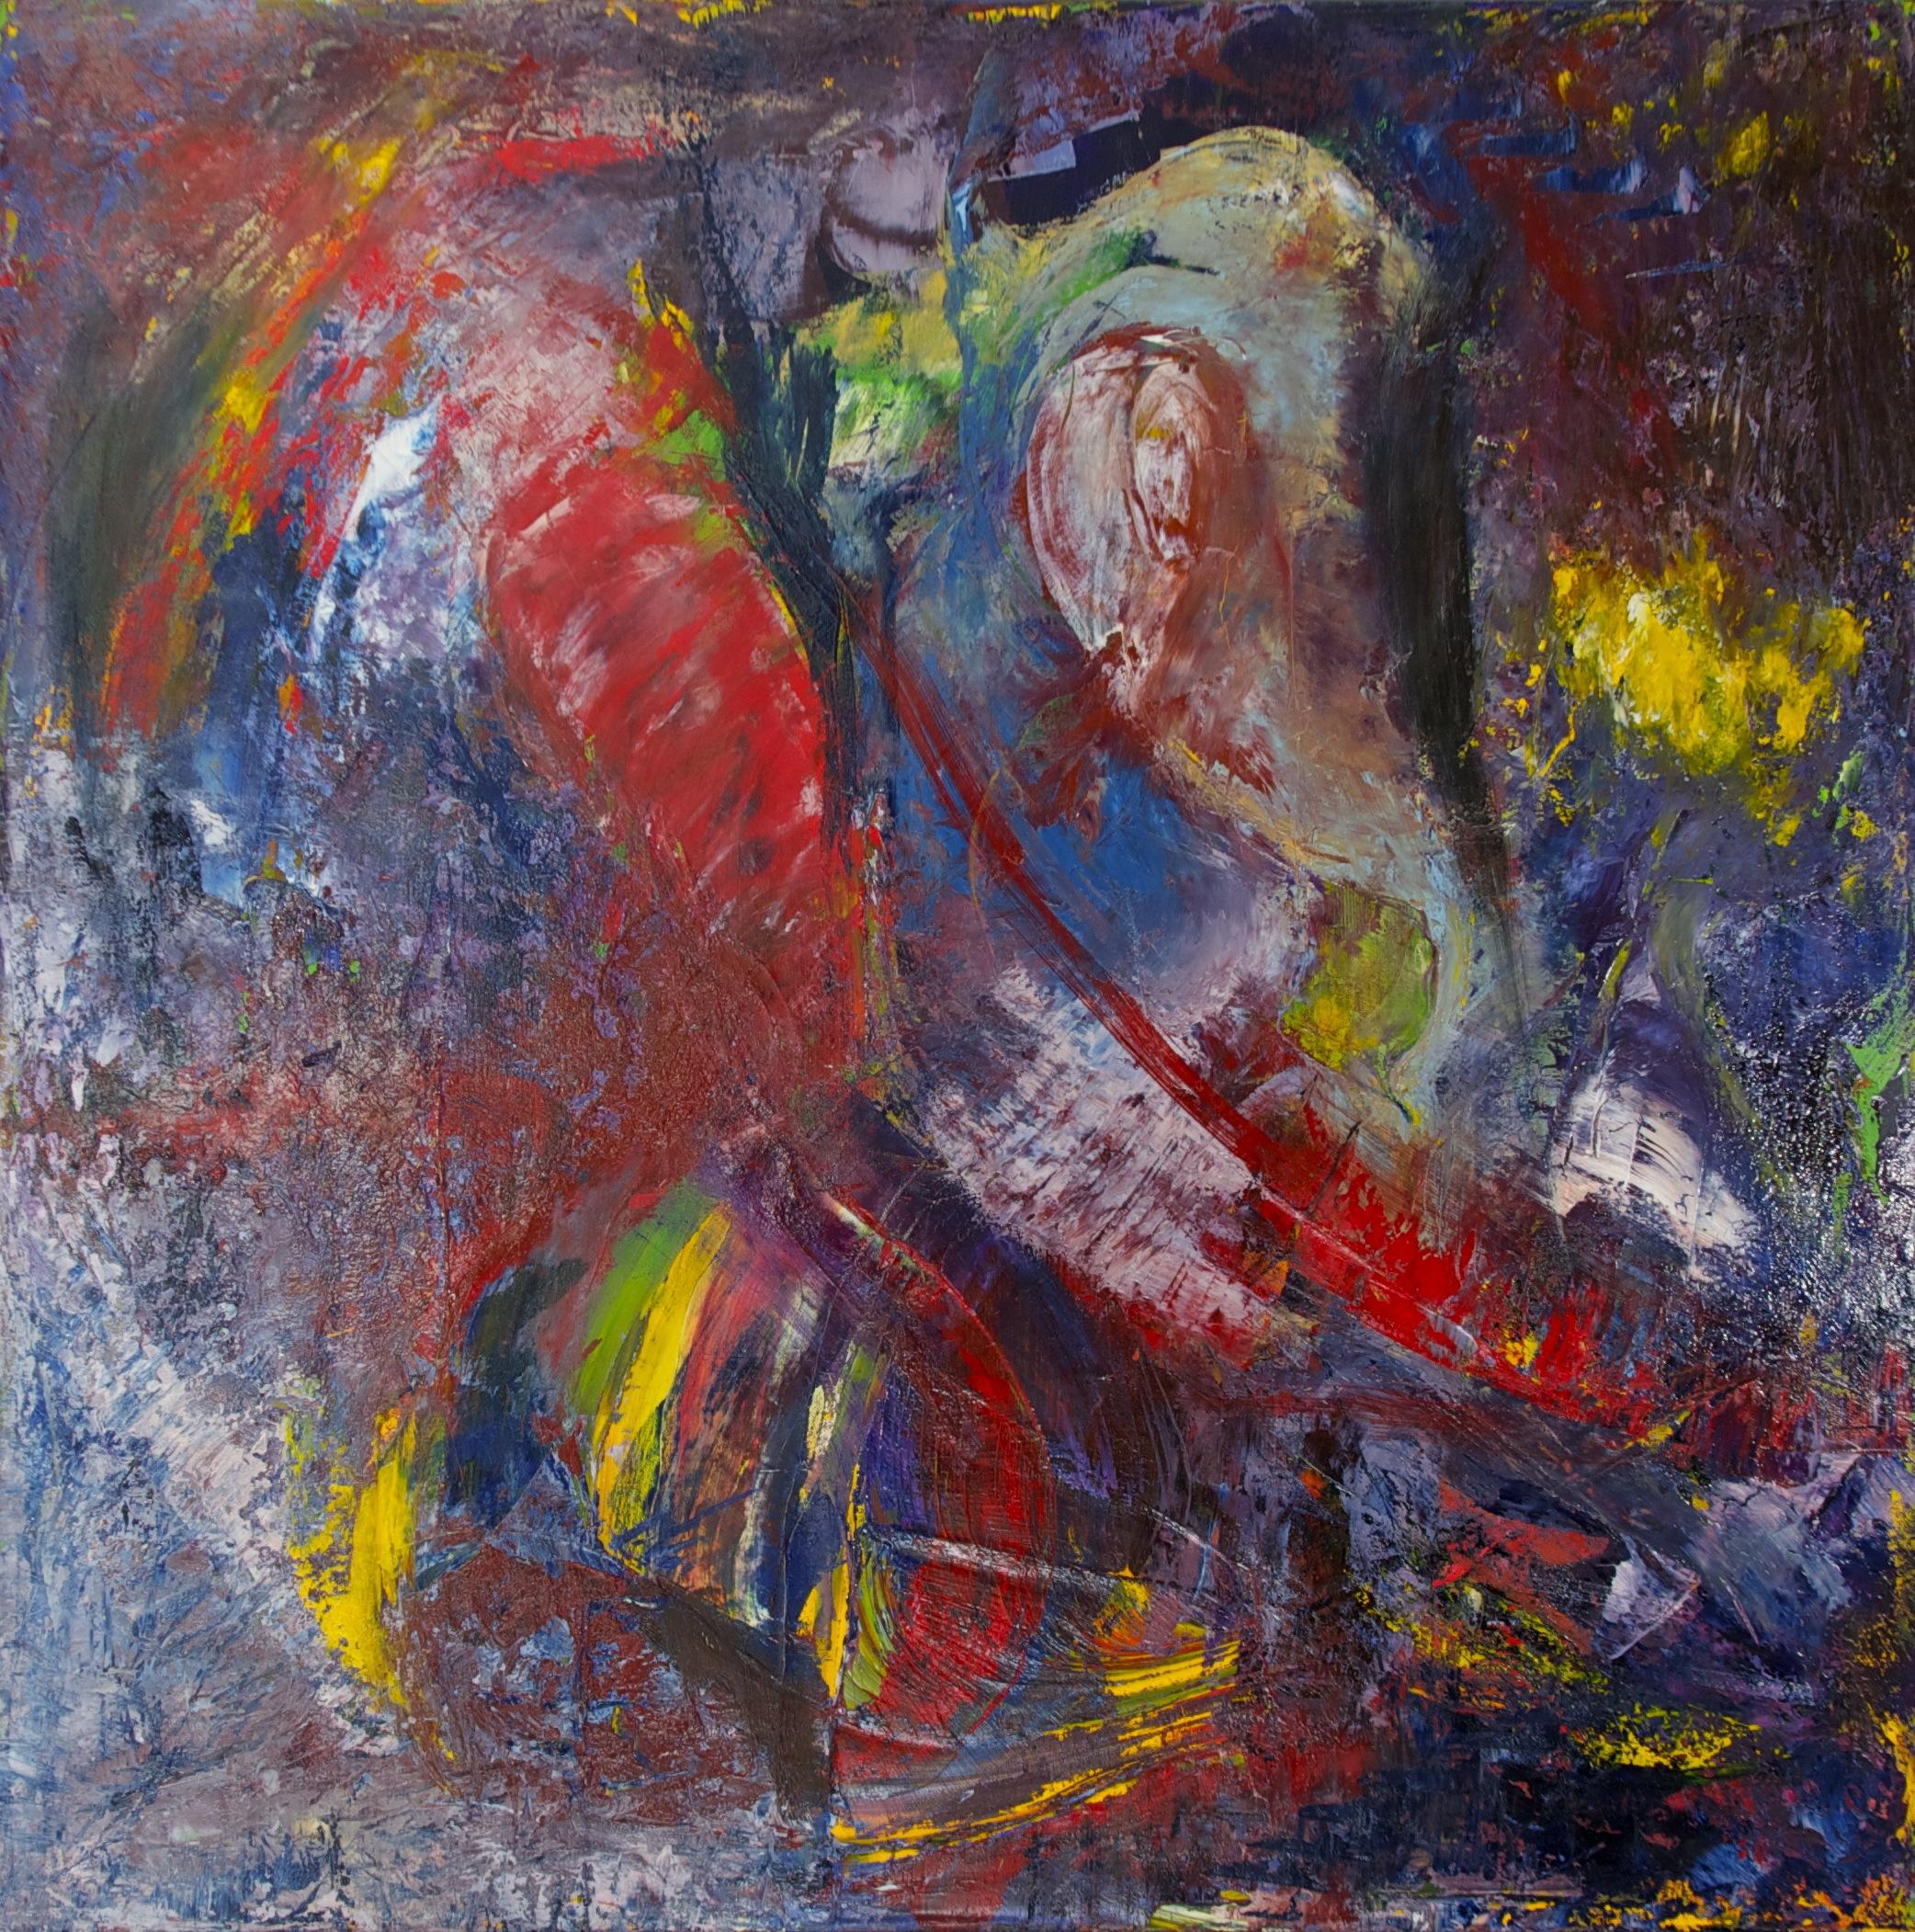 JAZZ IMPRESSION, 2013 Oil on canvas, 36 x 36 inches (91.4 x 91.4 cm).